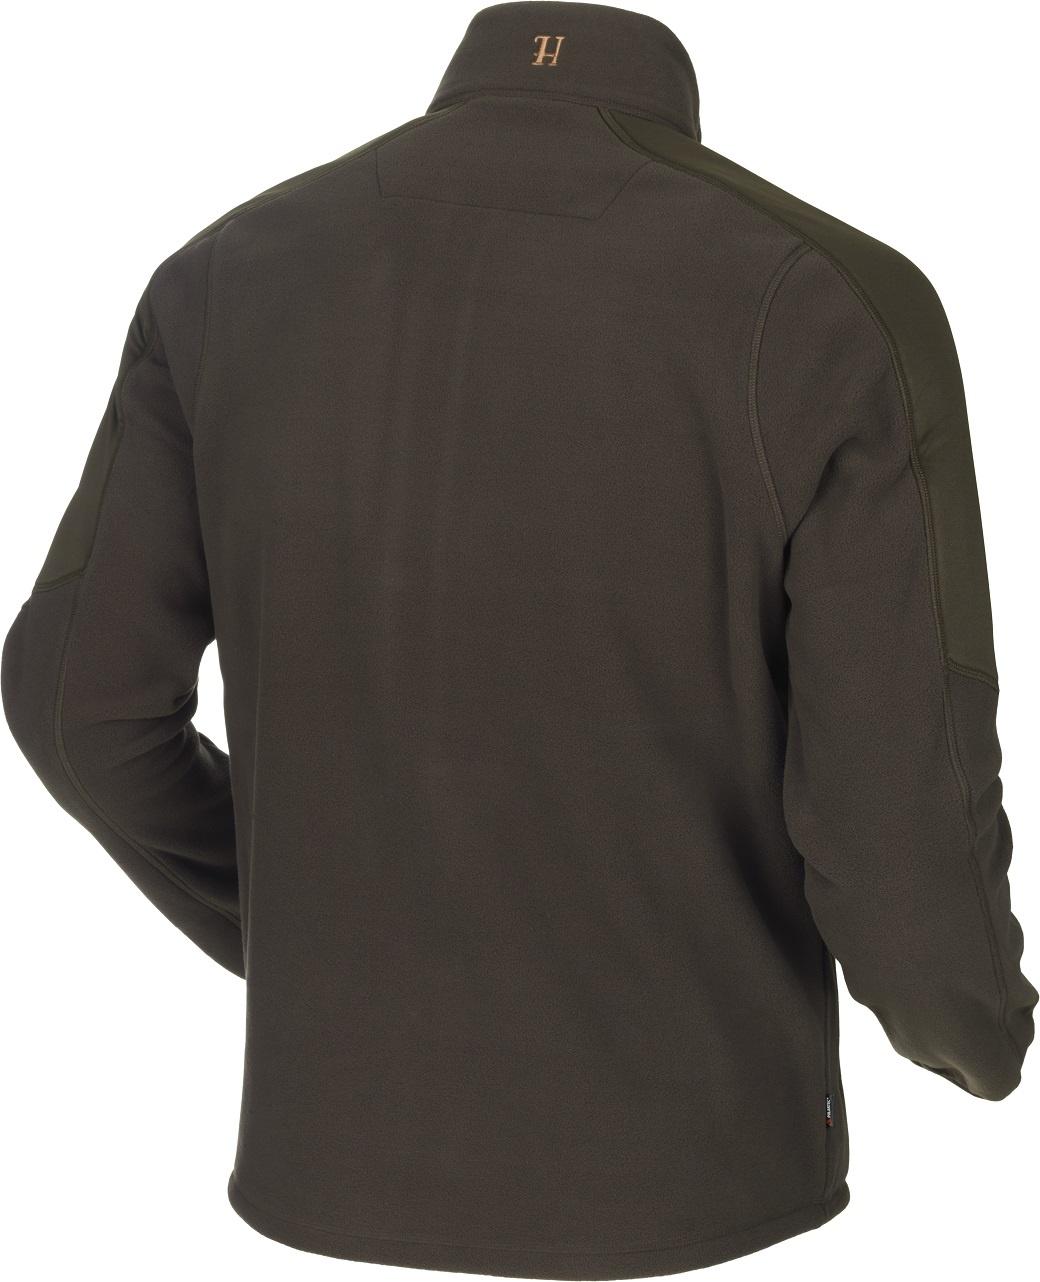 Härkila Venjan Fleece Jacket Shadow Brown Willow Green-2